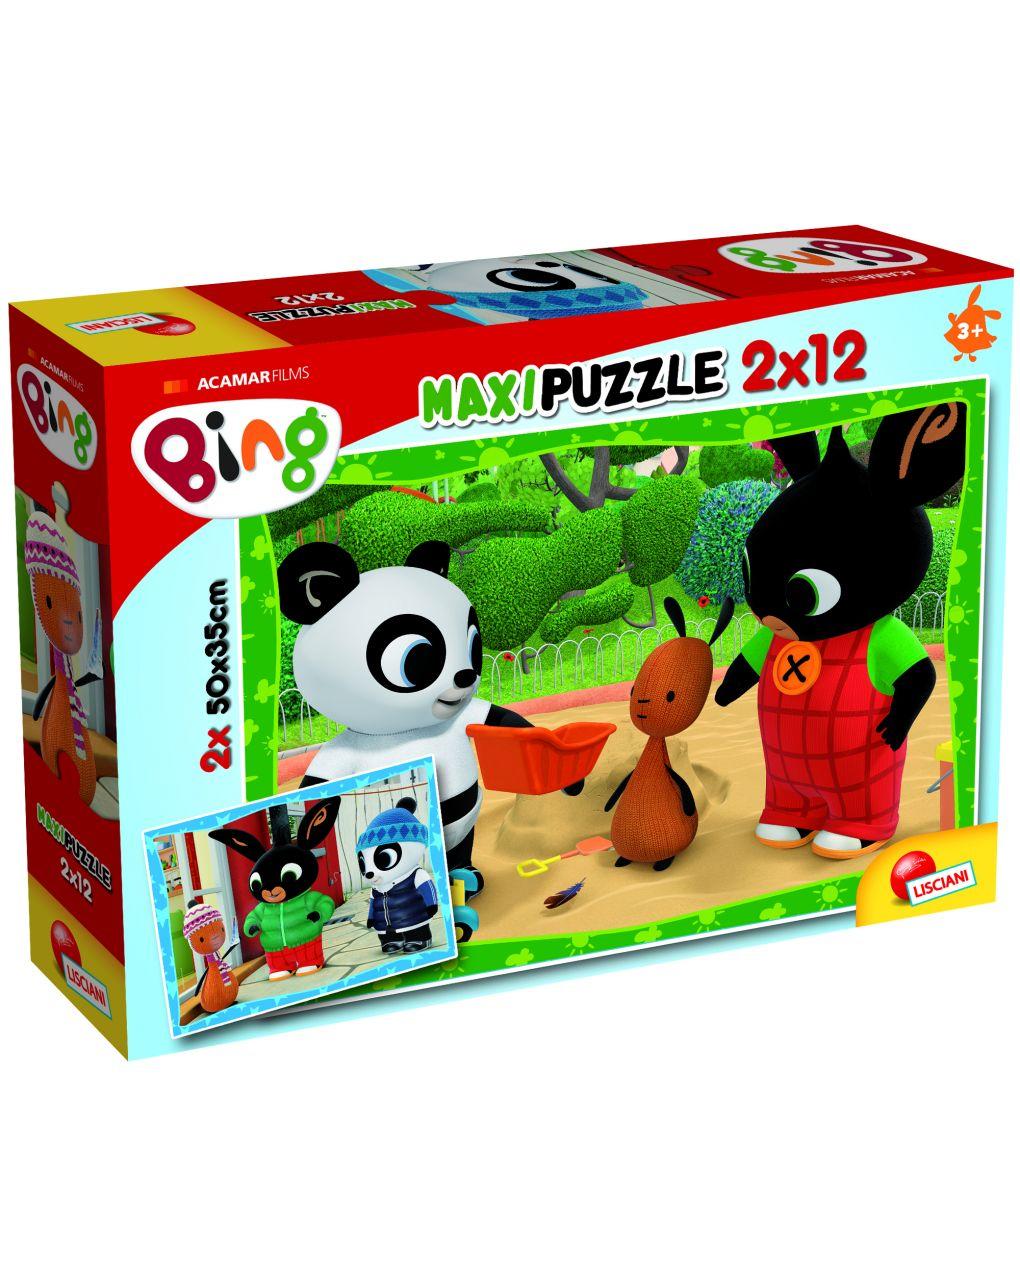 Bing puzzle supermaxi 12x 2 - bing e seus amigos! - Bing